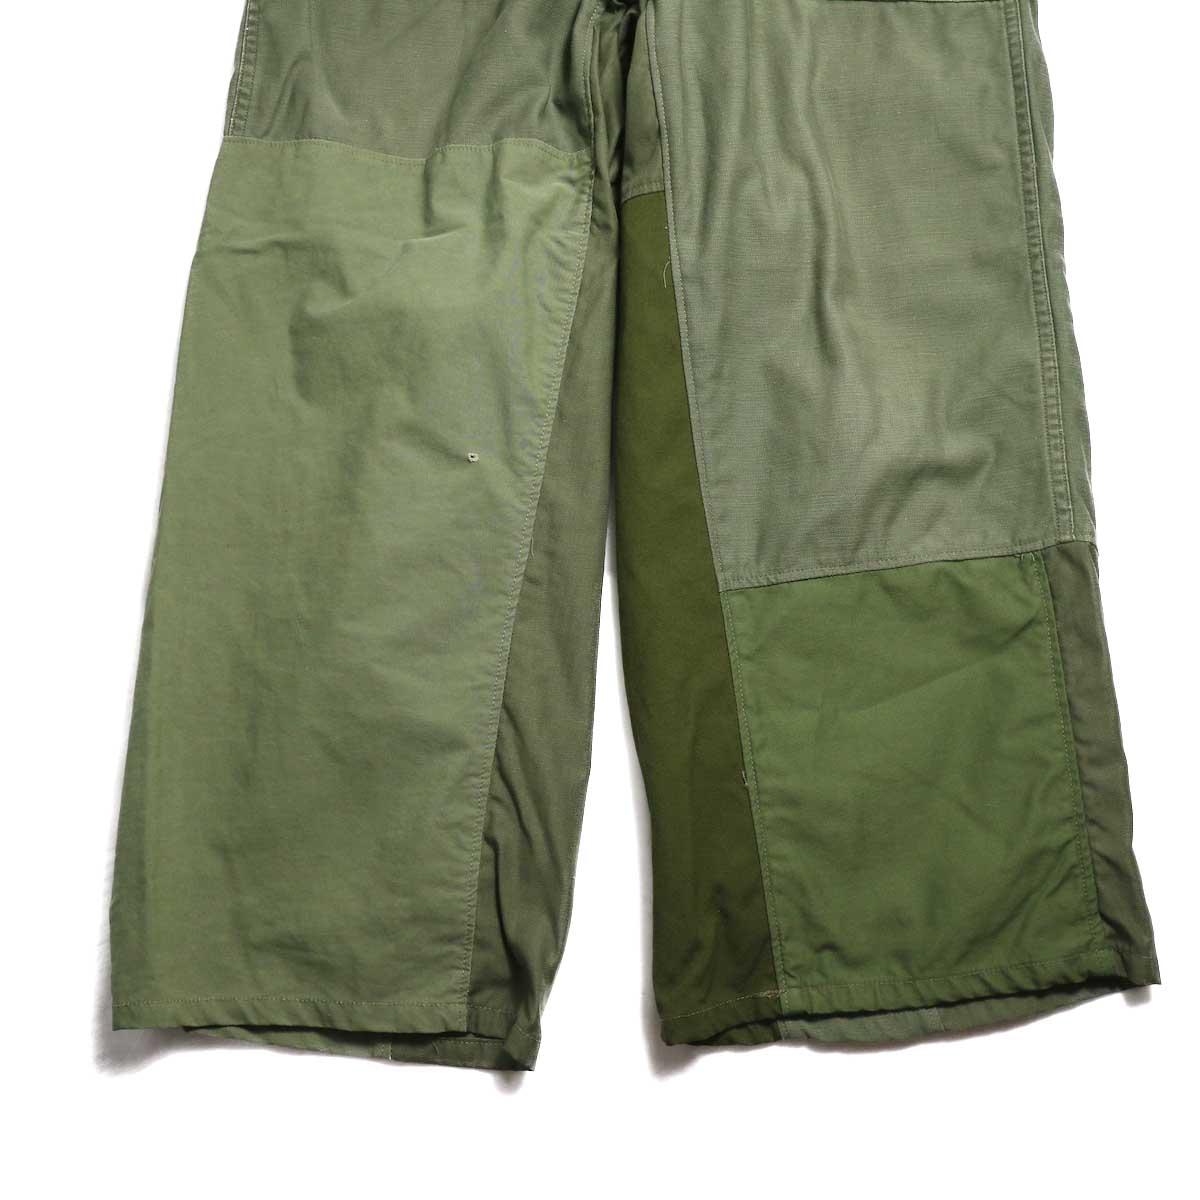 BONUM / Military FAT Pants (Btype) 股下